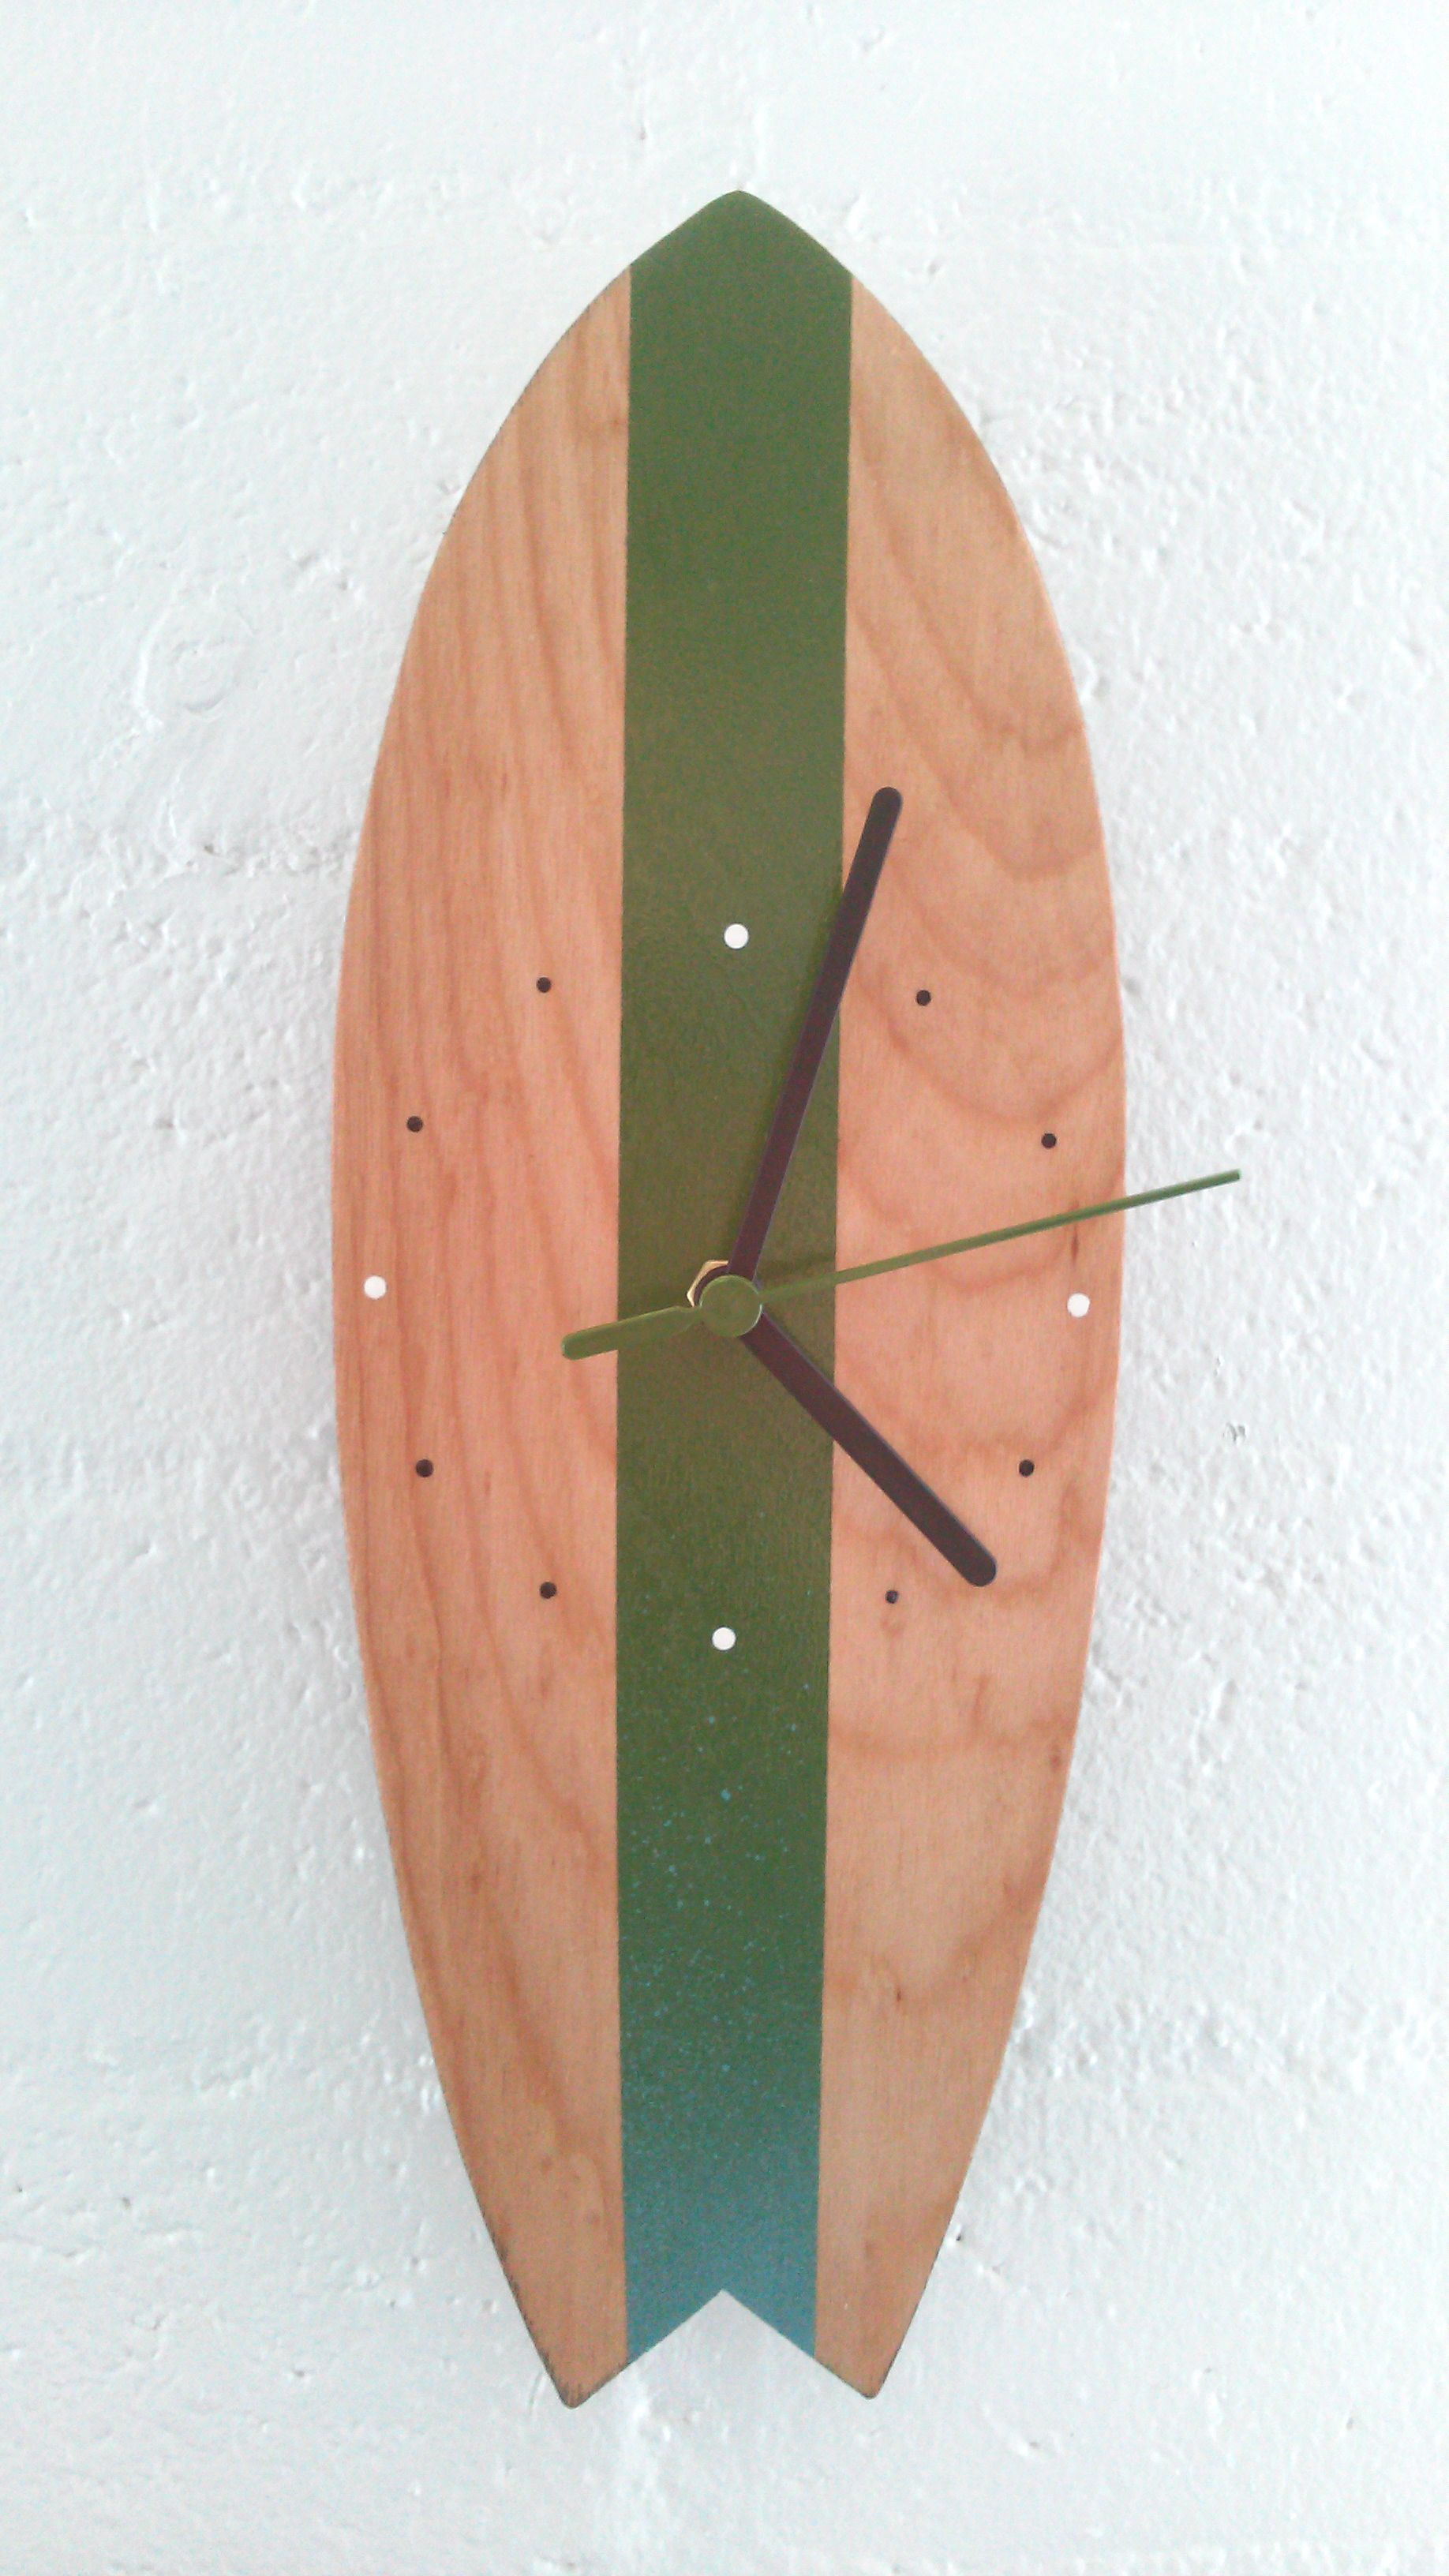 Handmade, wall hanging, wooden surfboard clock | trabajos en ...